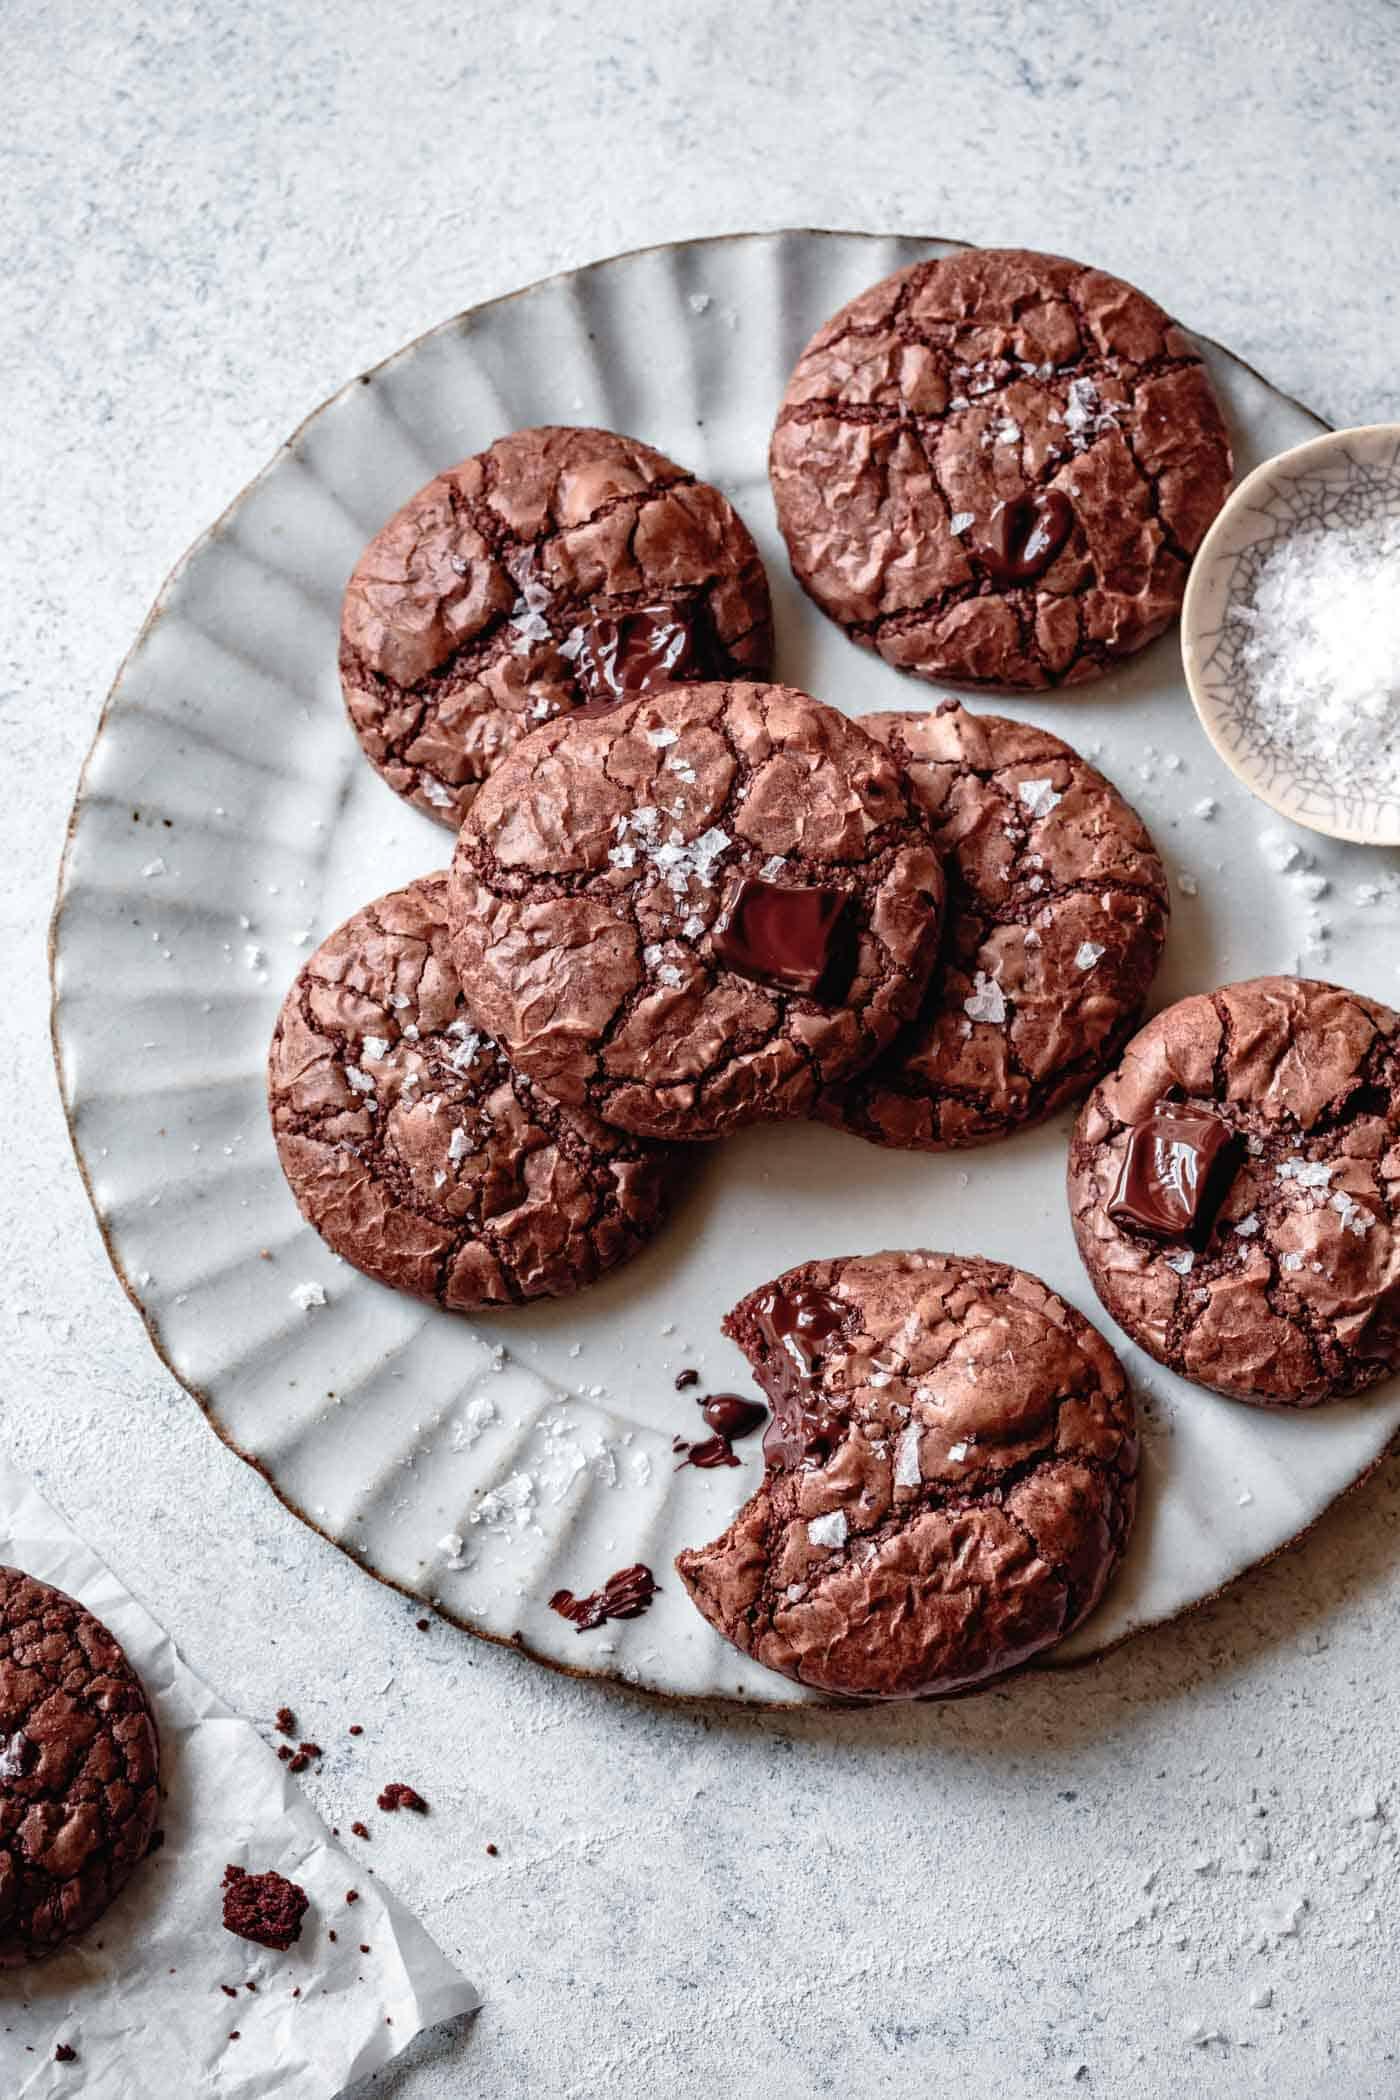 plate of gluten-free dairy-free chocolate cookies